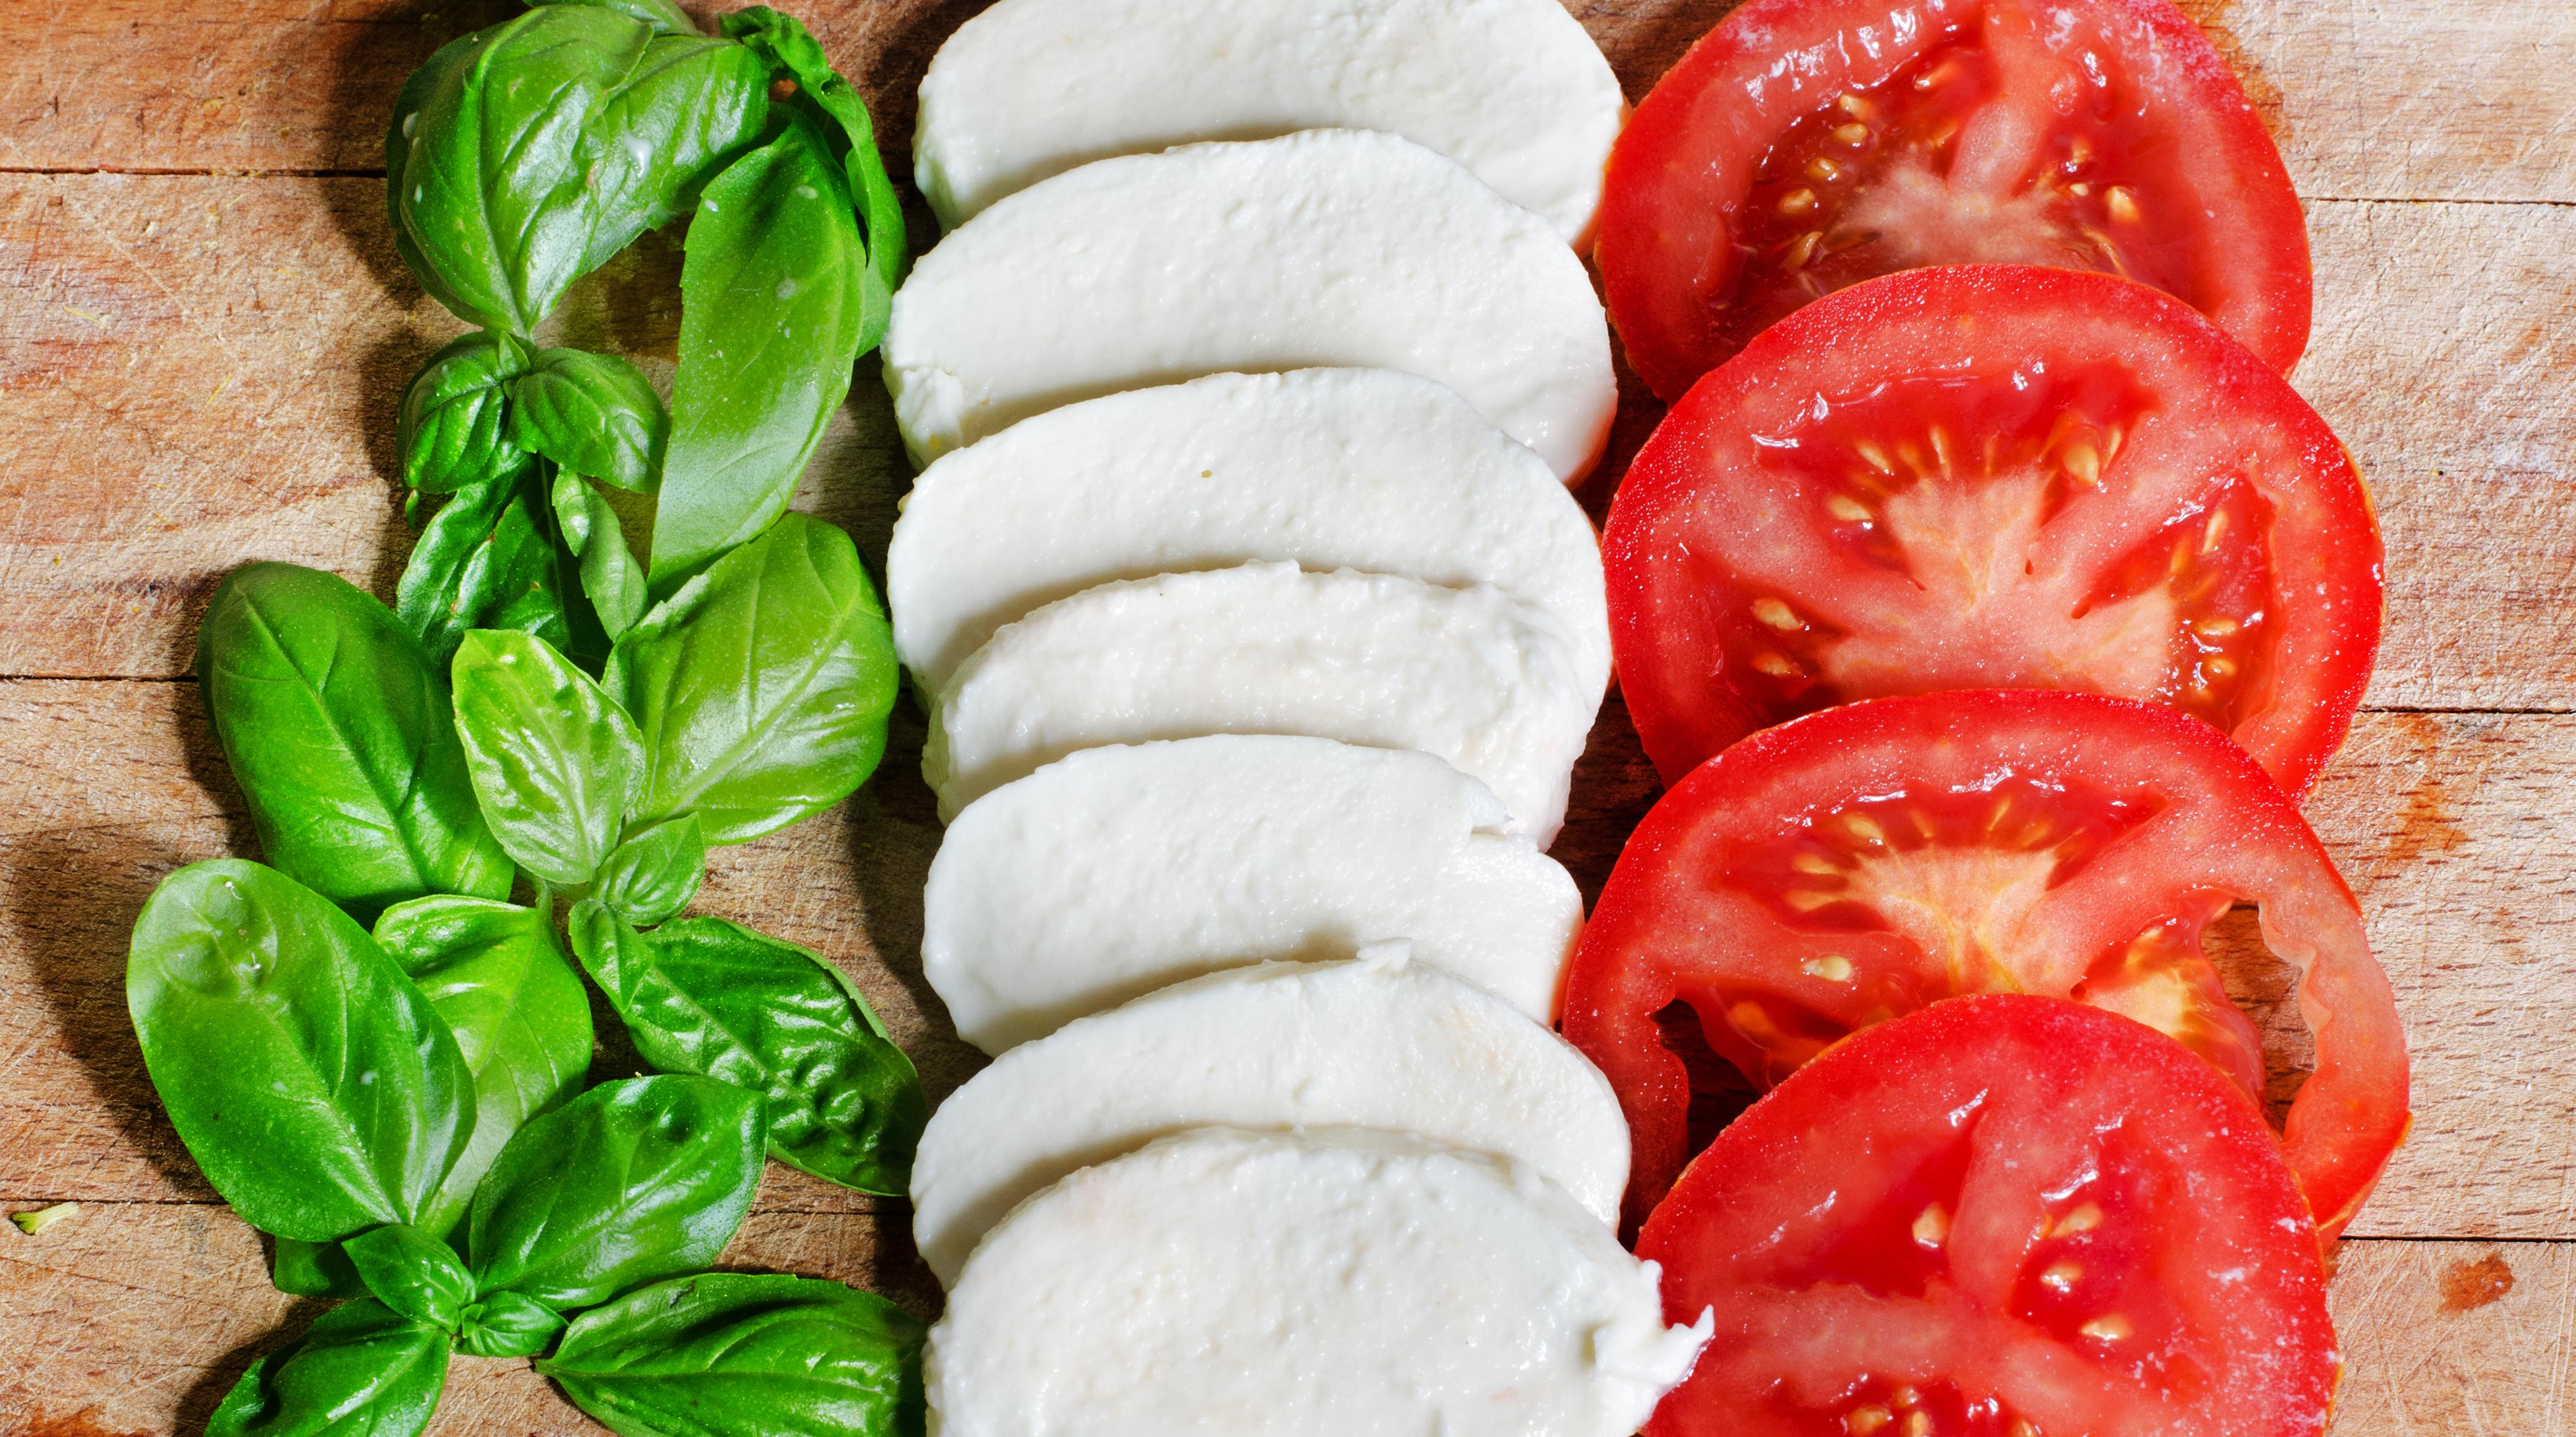 italiensk mat kristianstad